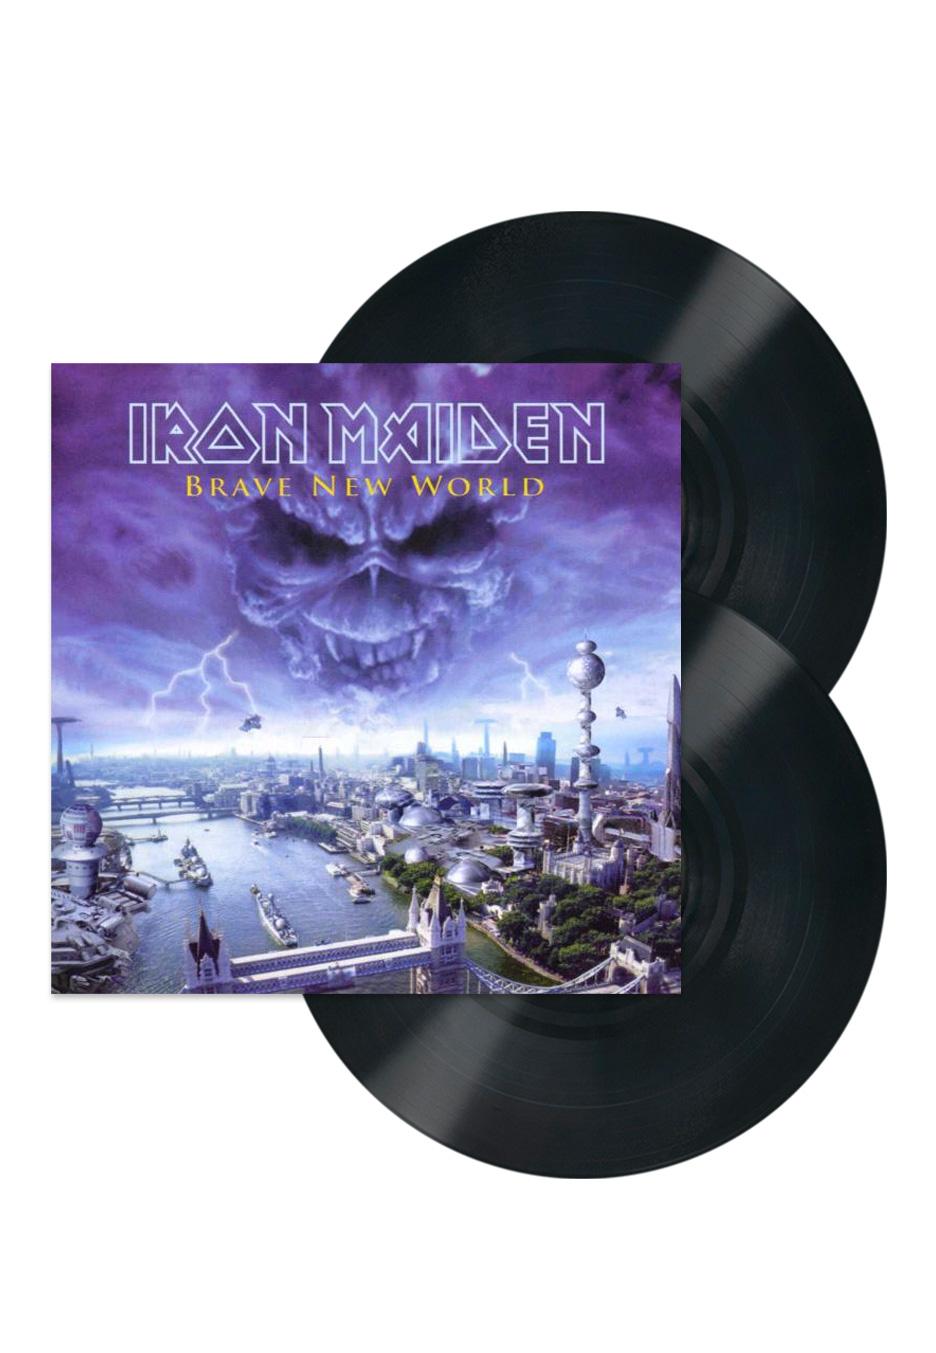 Iron Maiden - Brave New World - Vinyl